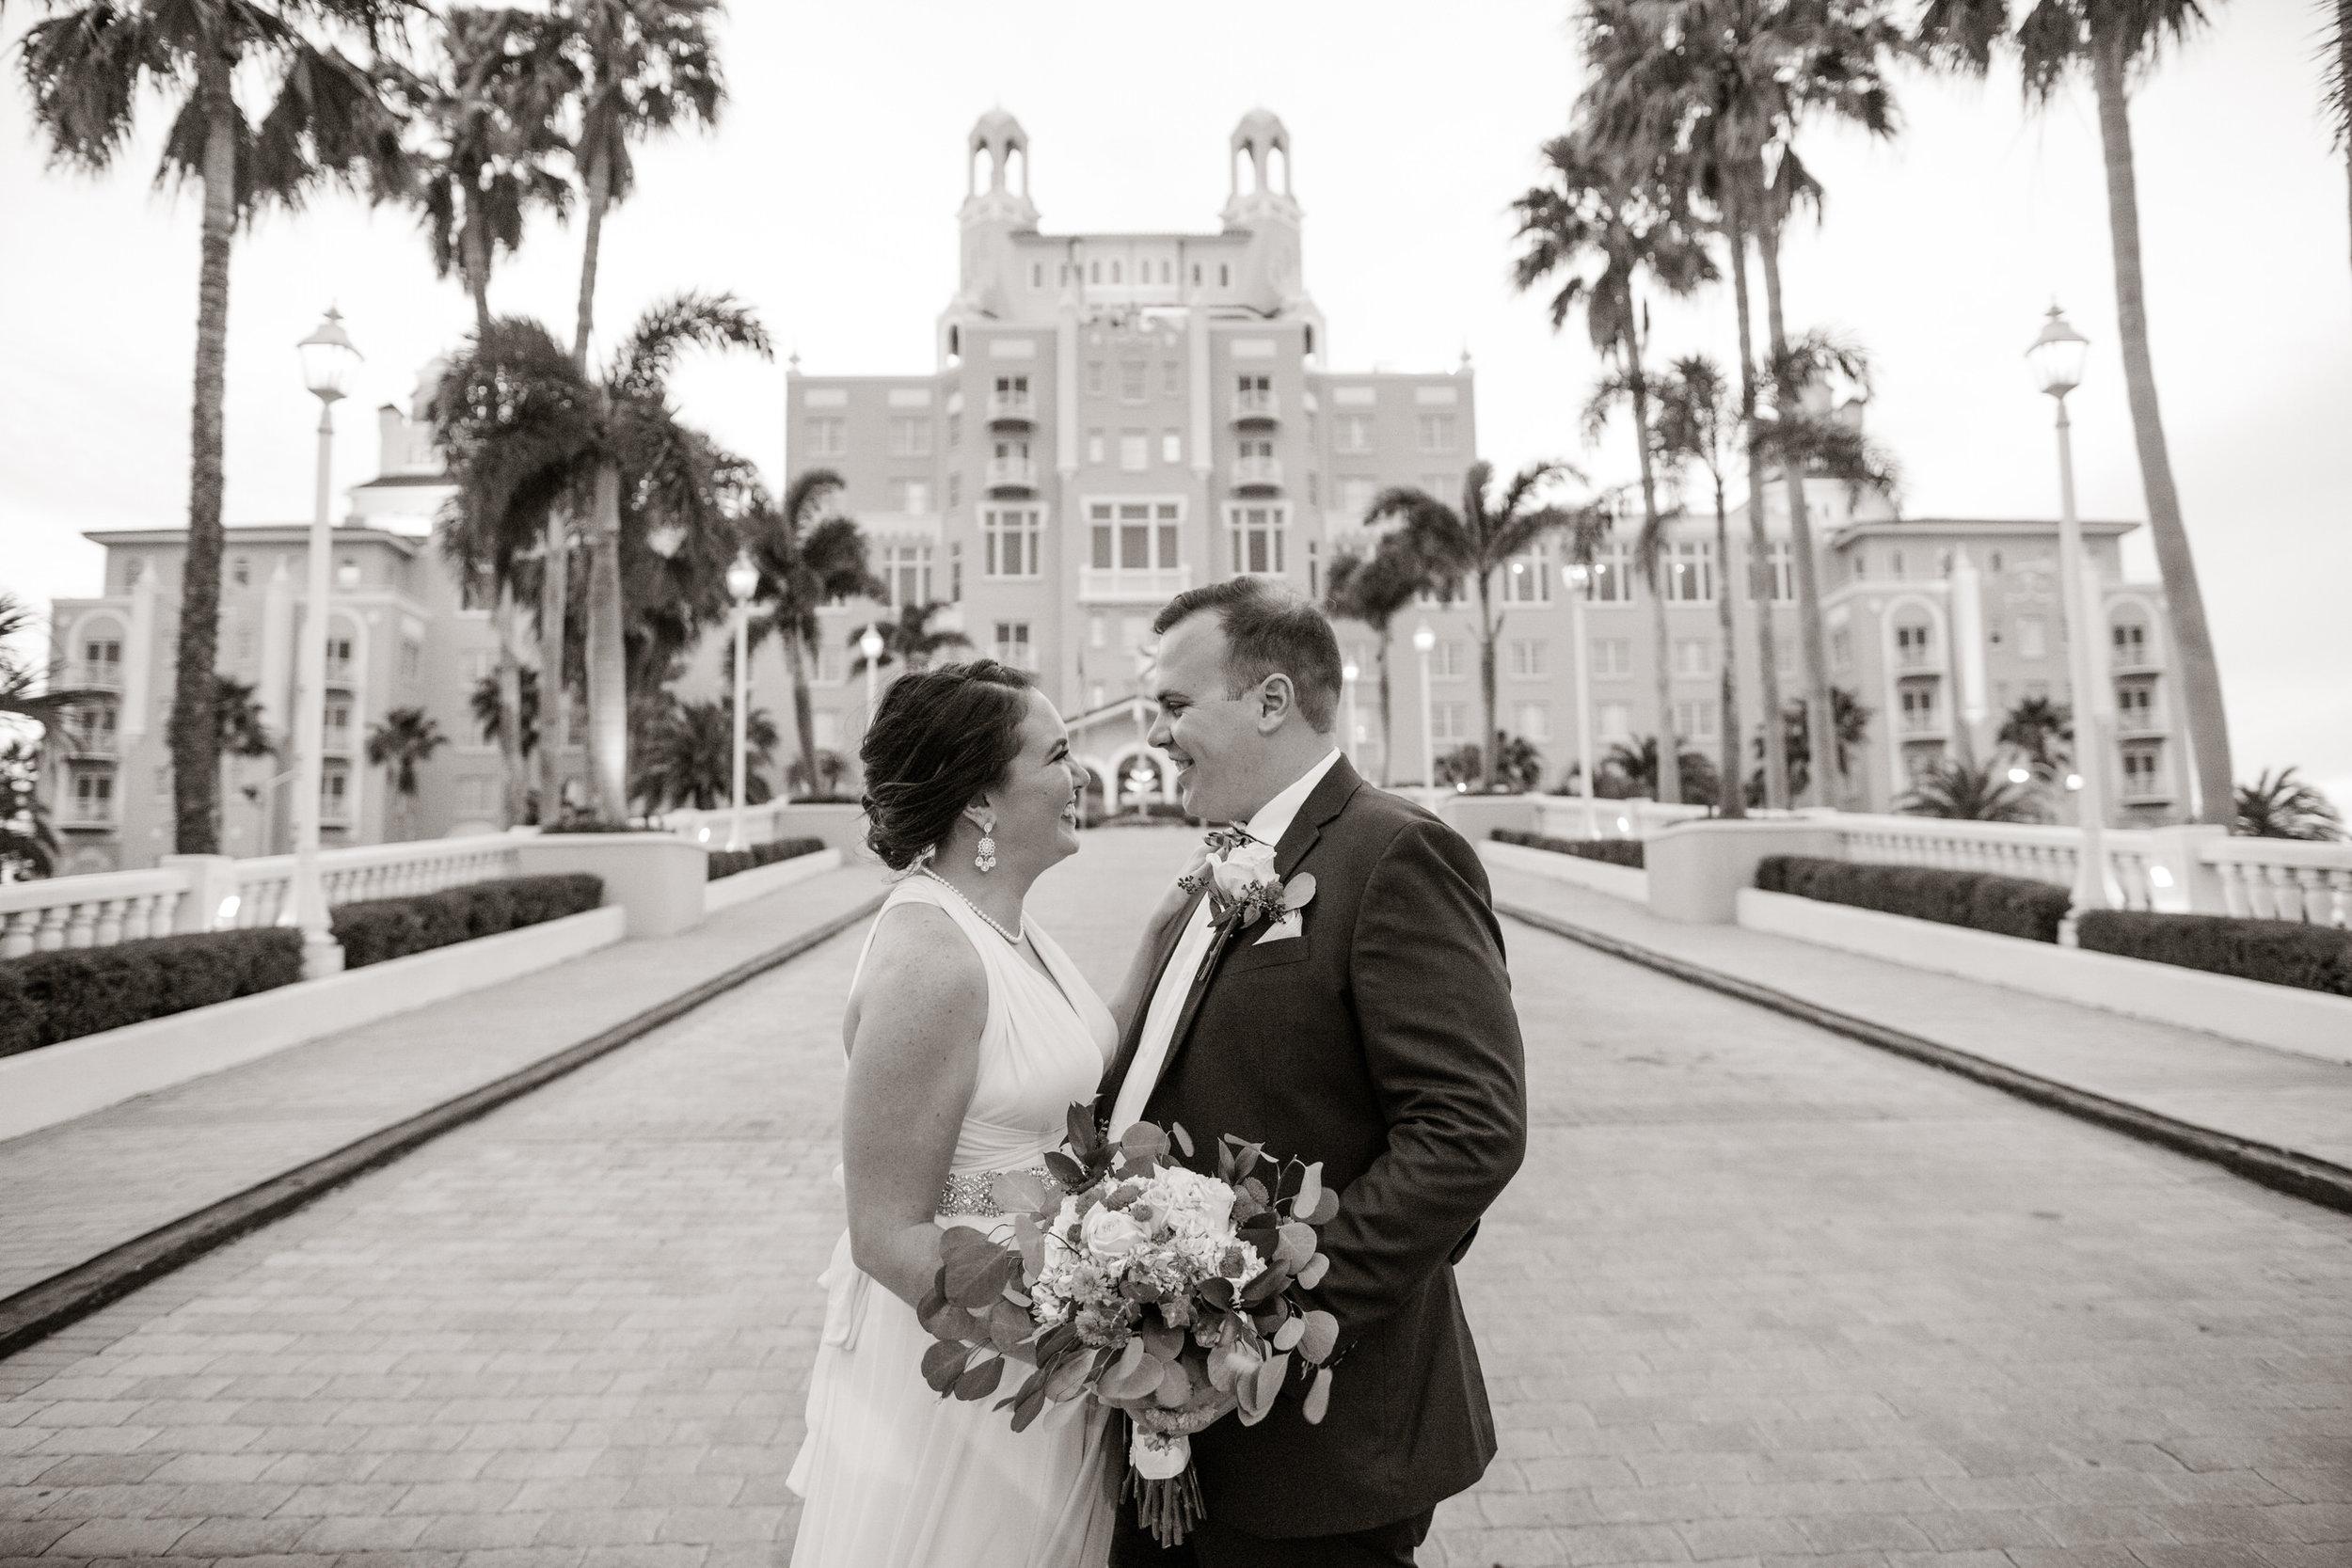 Beltran_Treasure_Island_Elopement_Tampa_Wedding_144-1.jpg